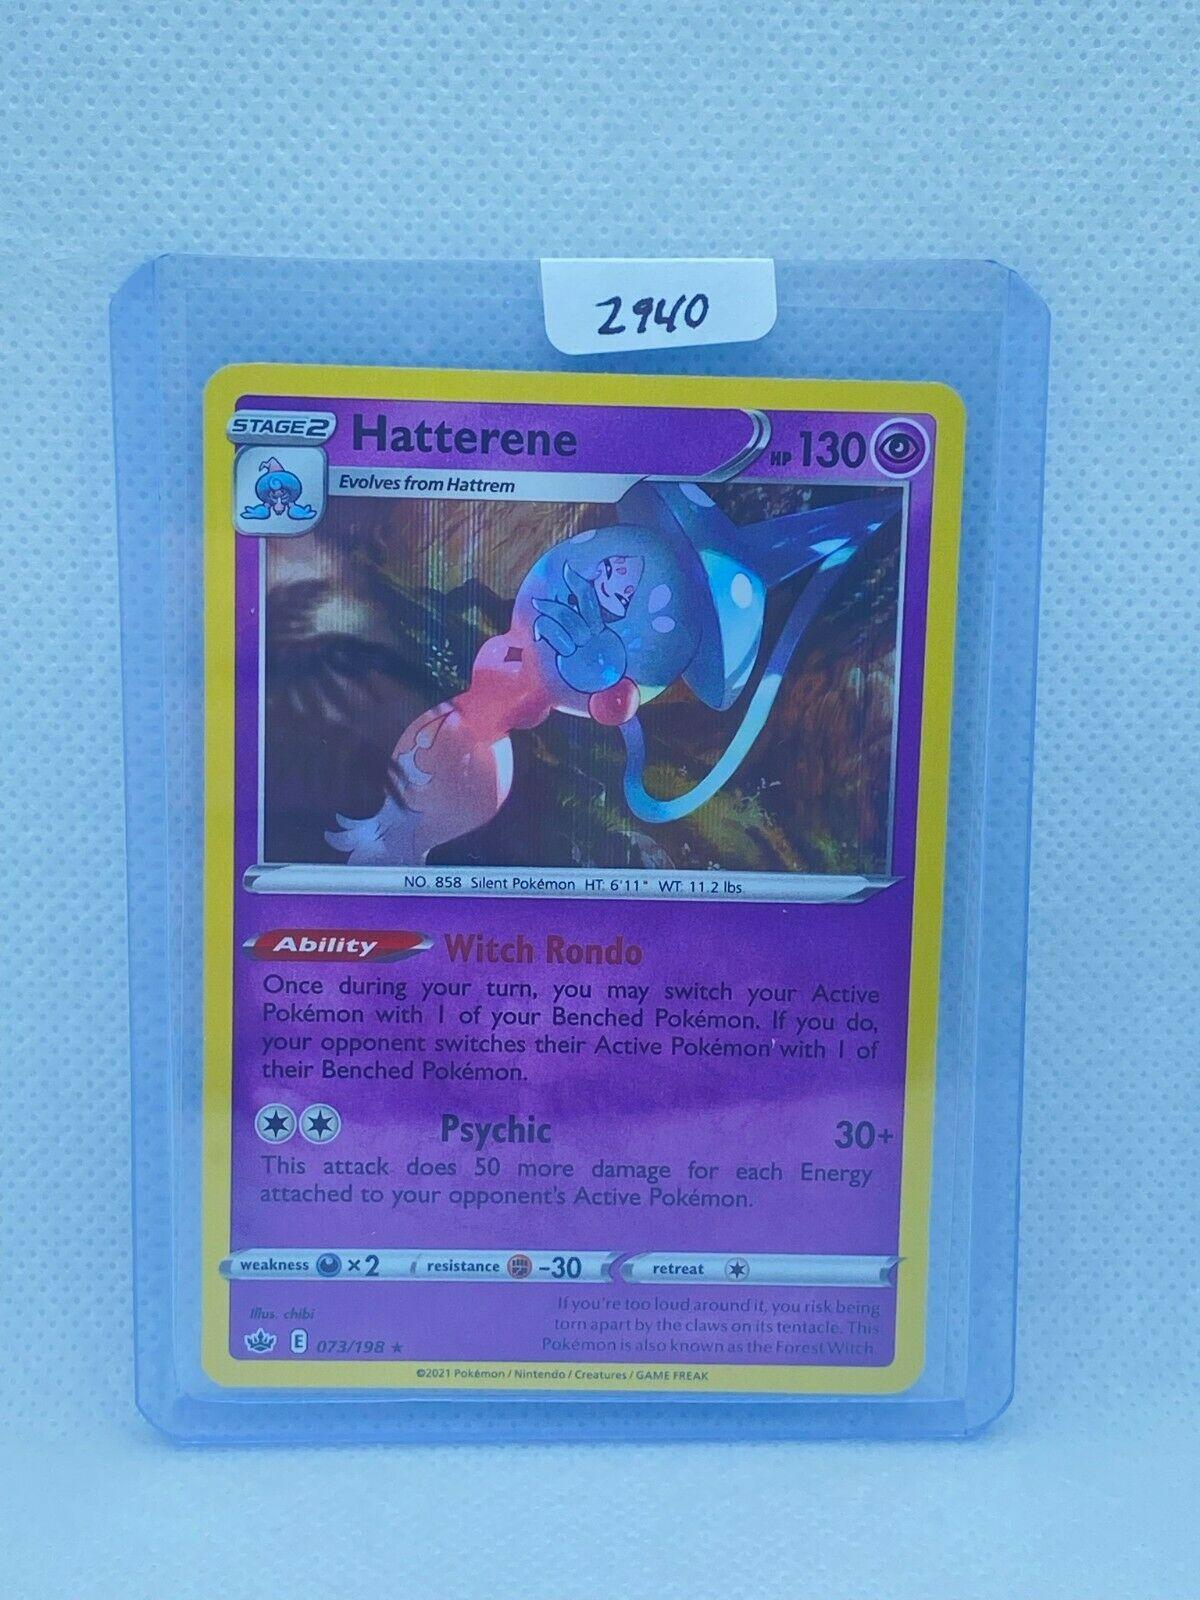 Pokémon TCG Hatterene Holo 073/198 | Chilling Reign | Play/Grade Ready